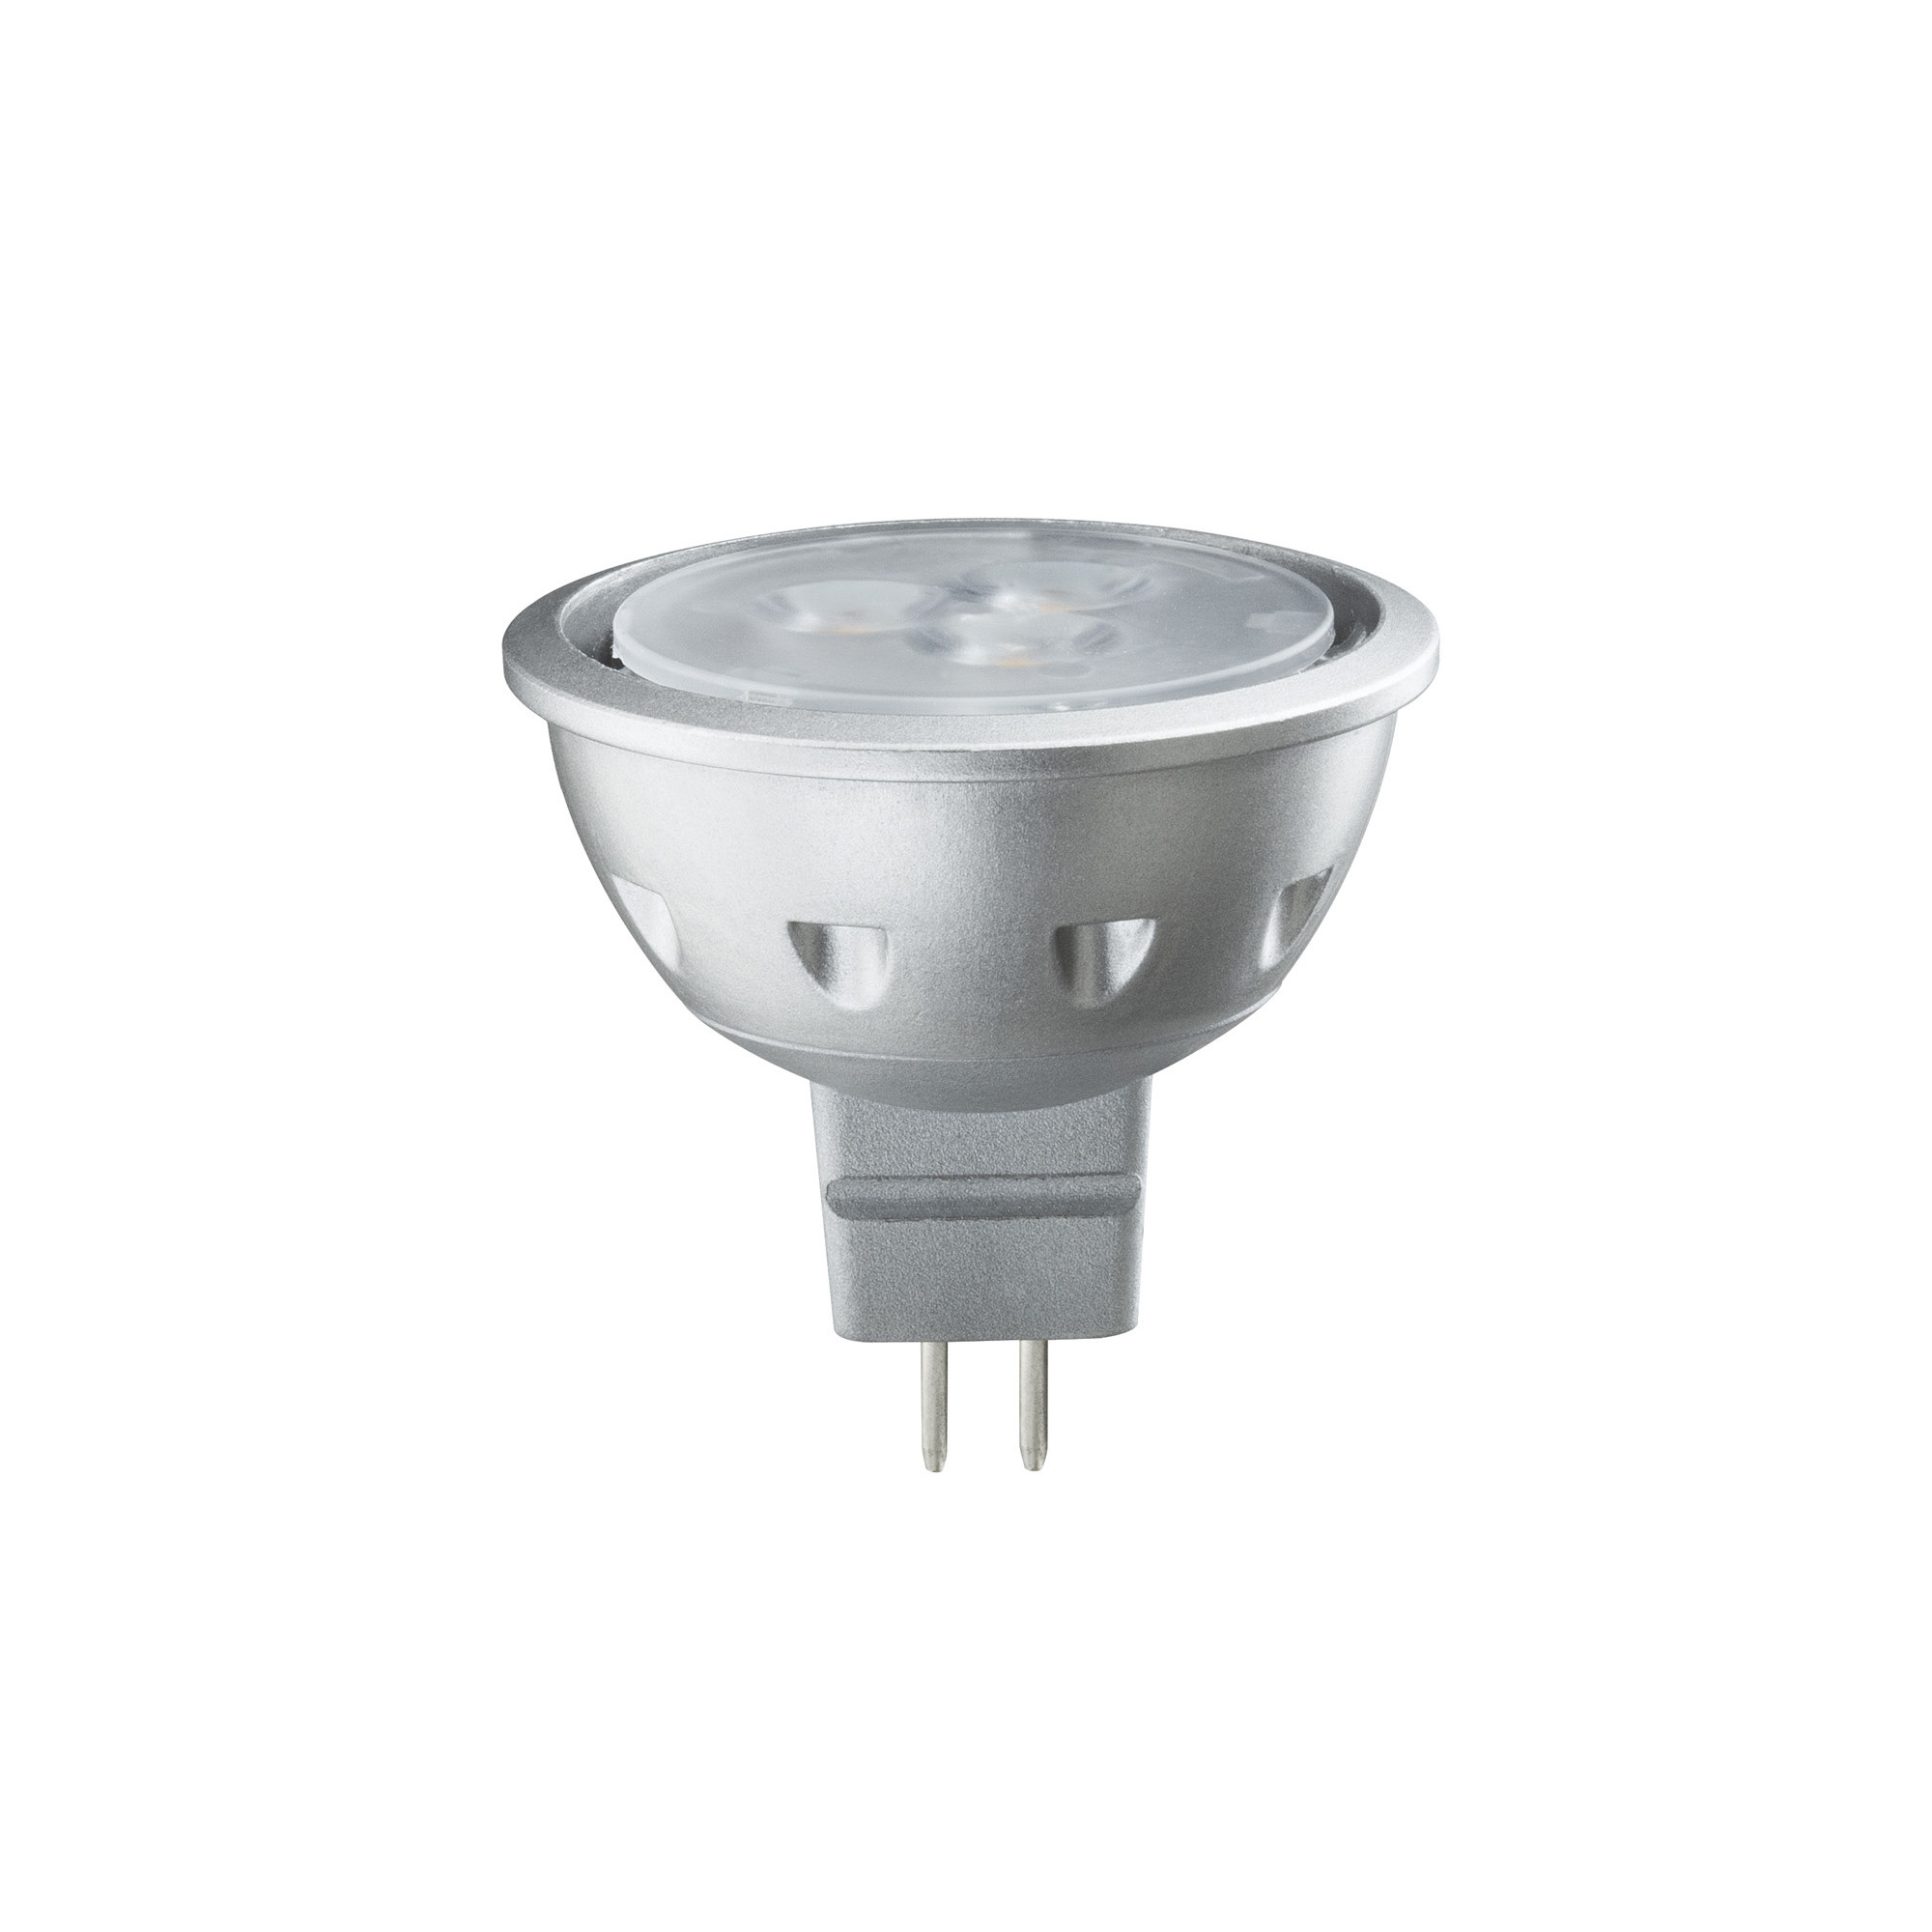 Лампа светодиодная Paulmann 28157 GU5.3 270 Лм теплый свет